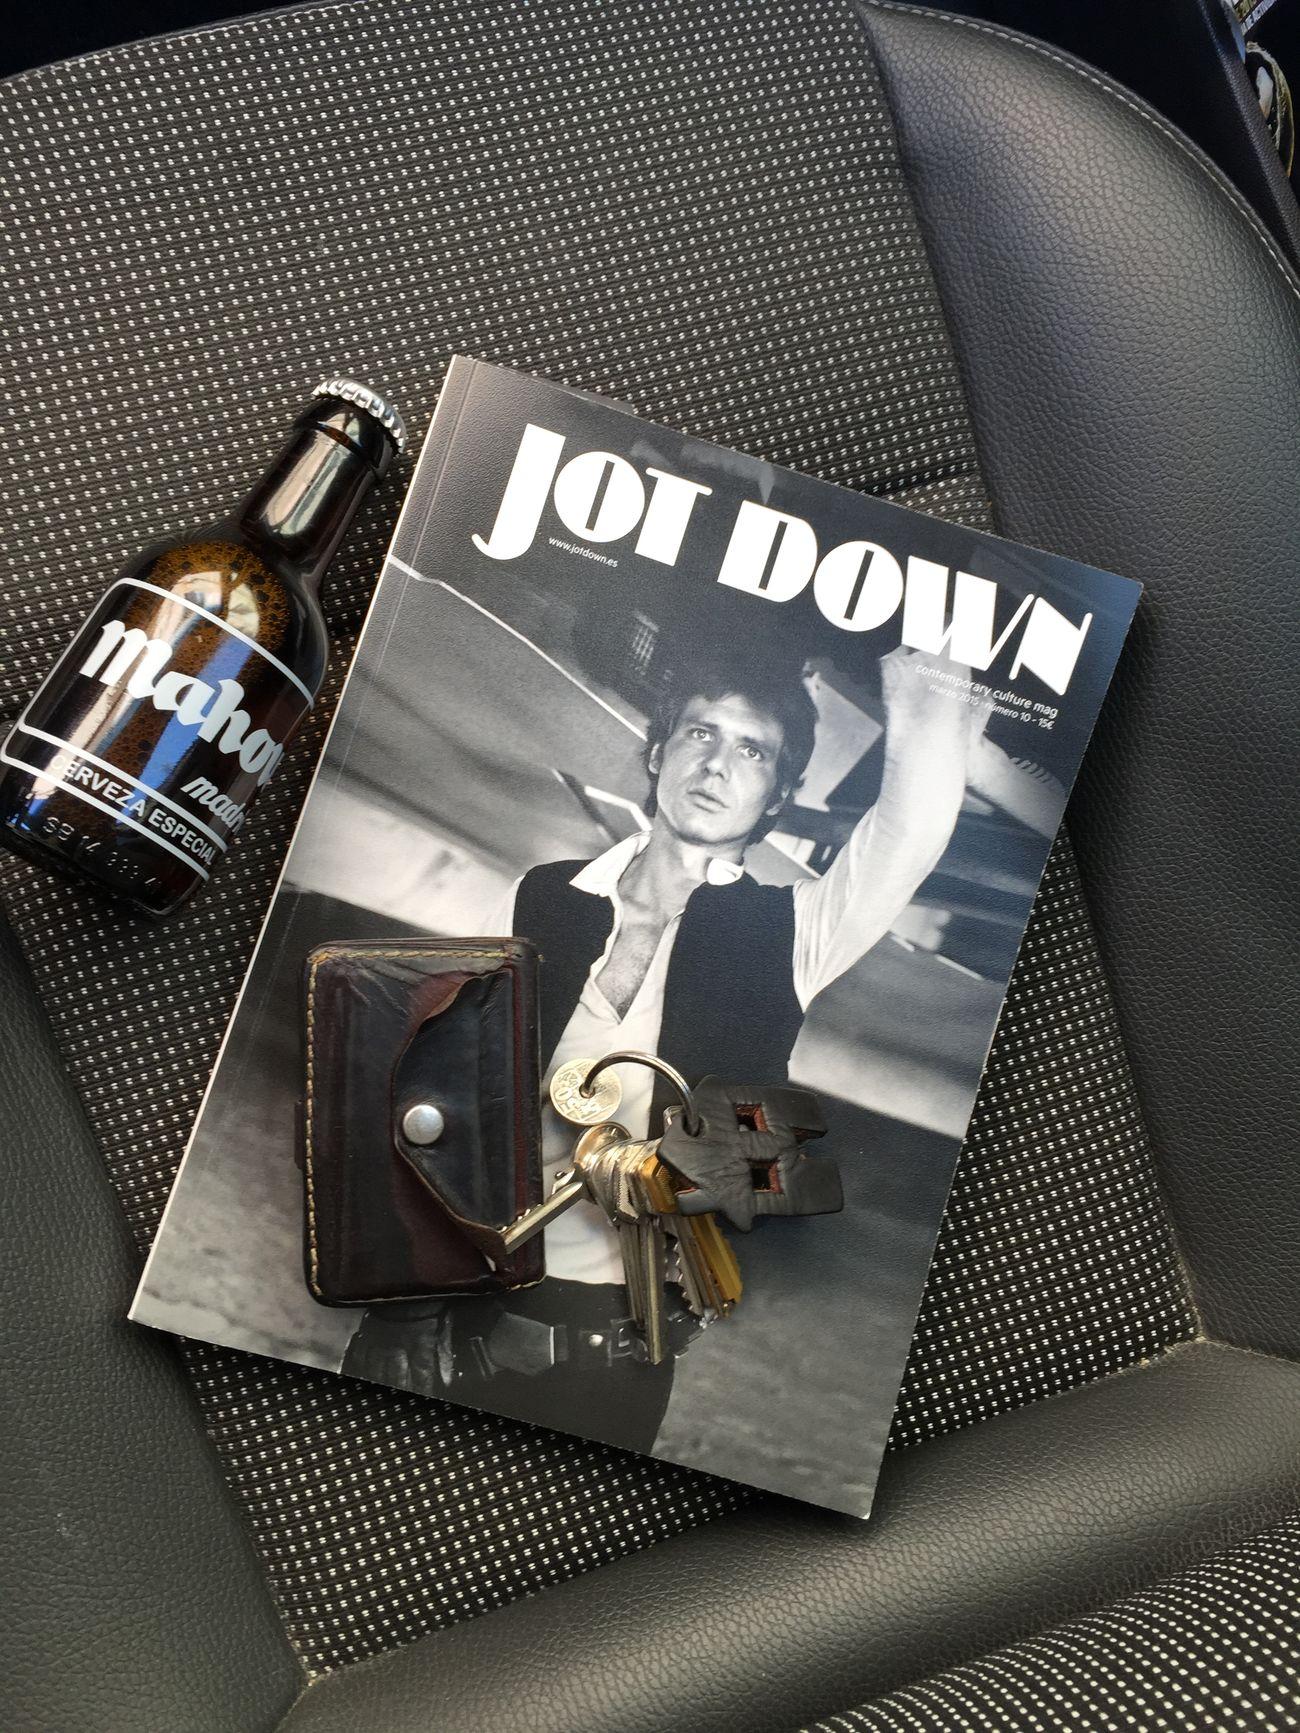 Detodounpoco Jot Down Botellin